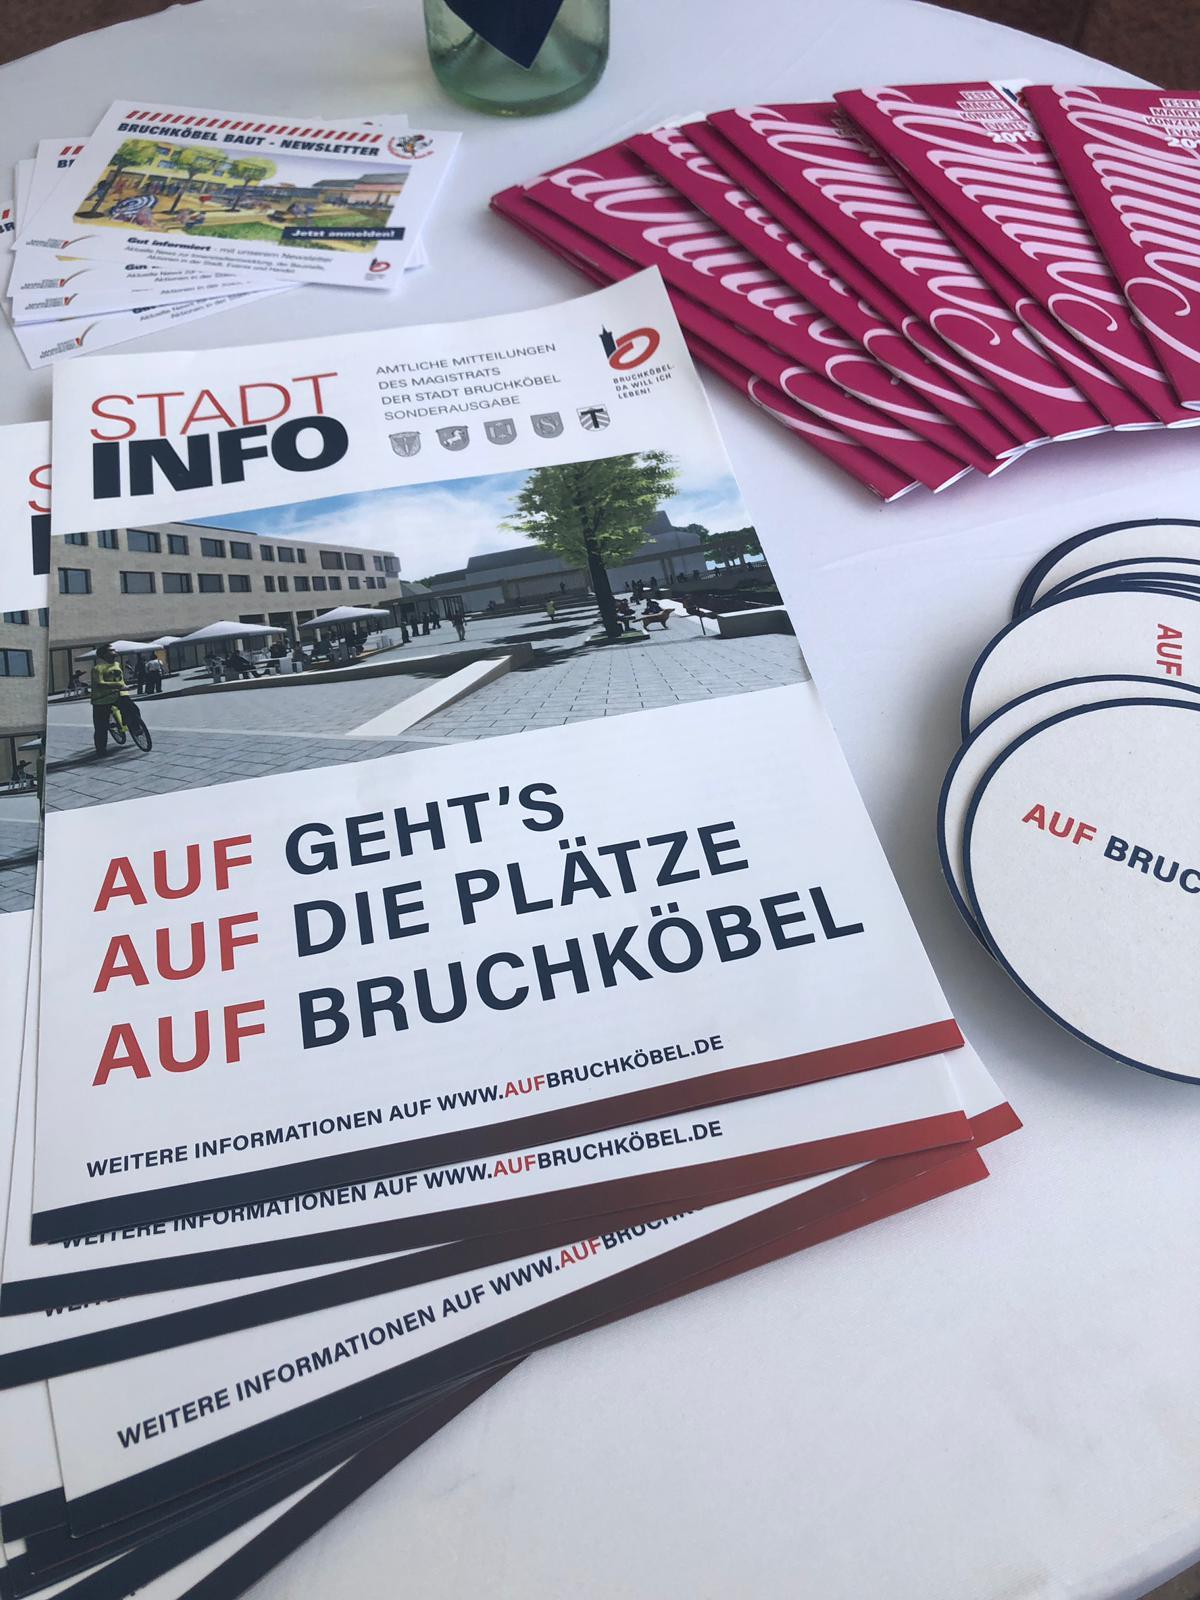 Bruchkoebel_Infomaterialien_StadtmarketingBruchköbelGmbH